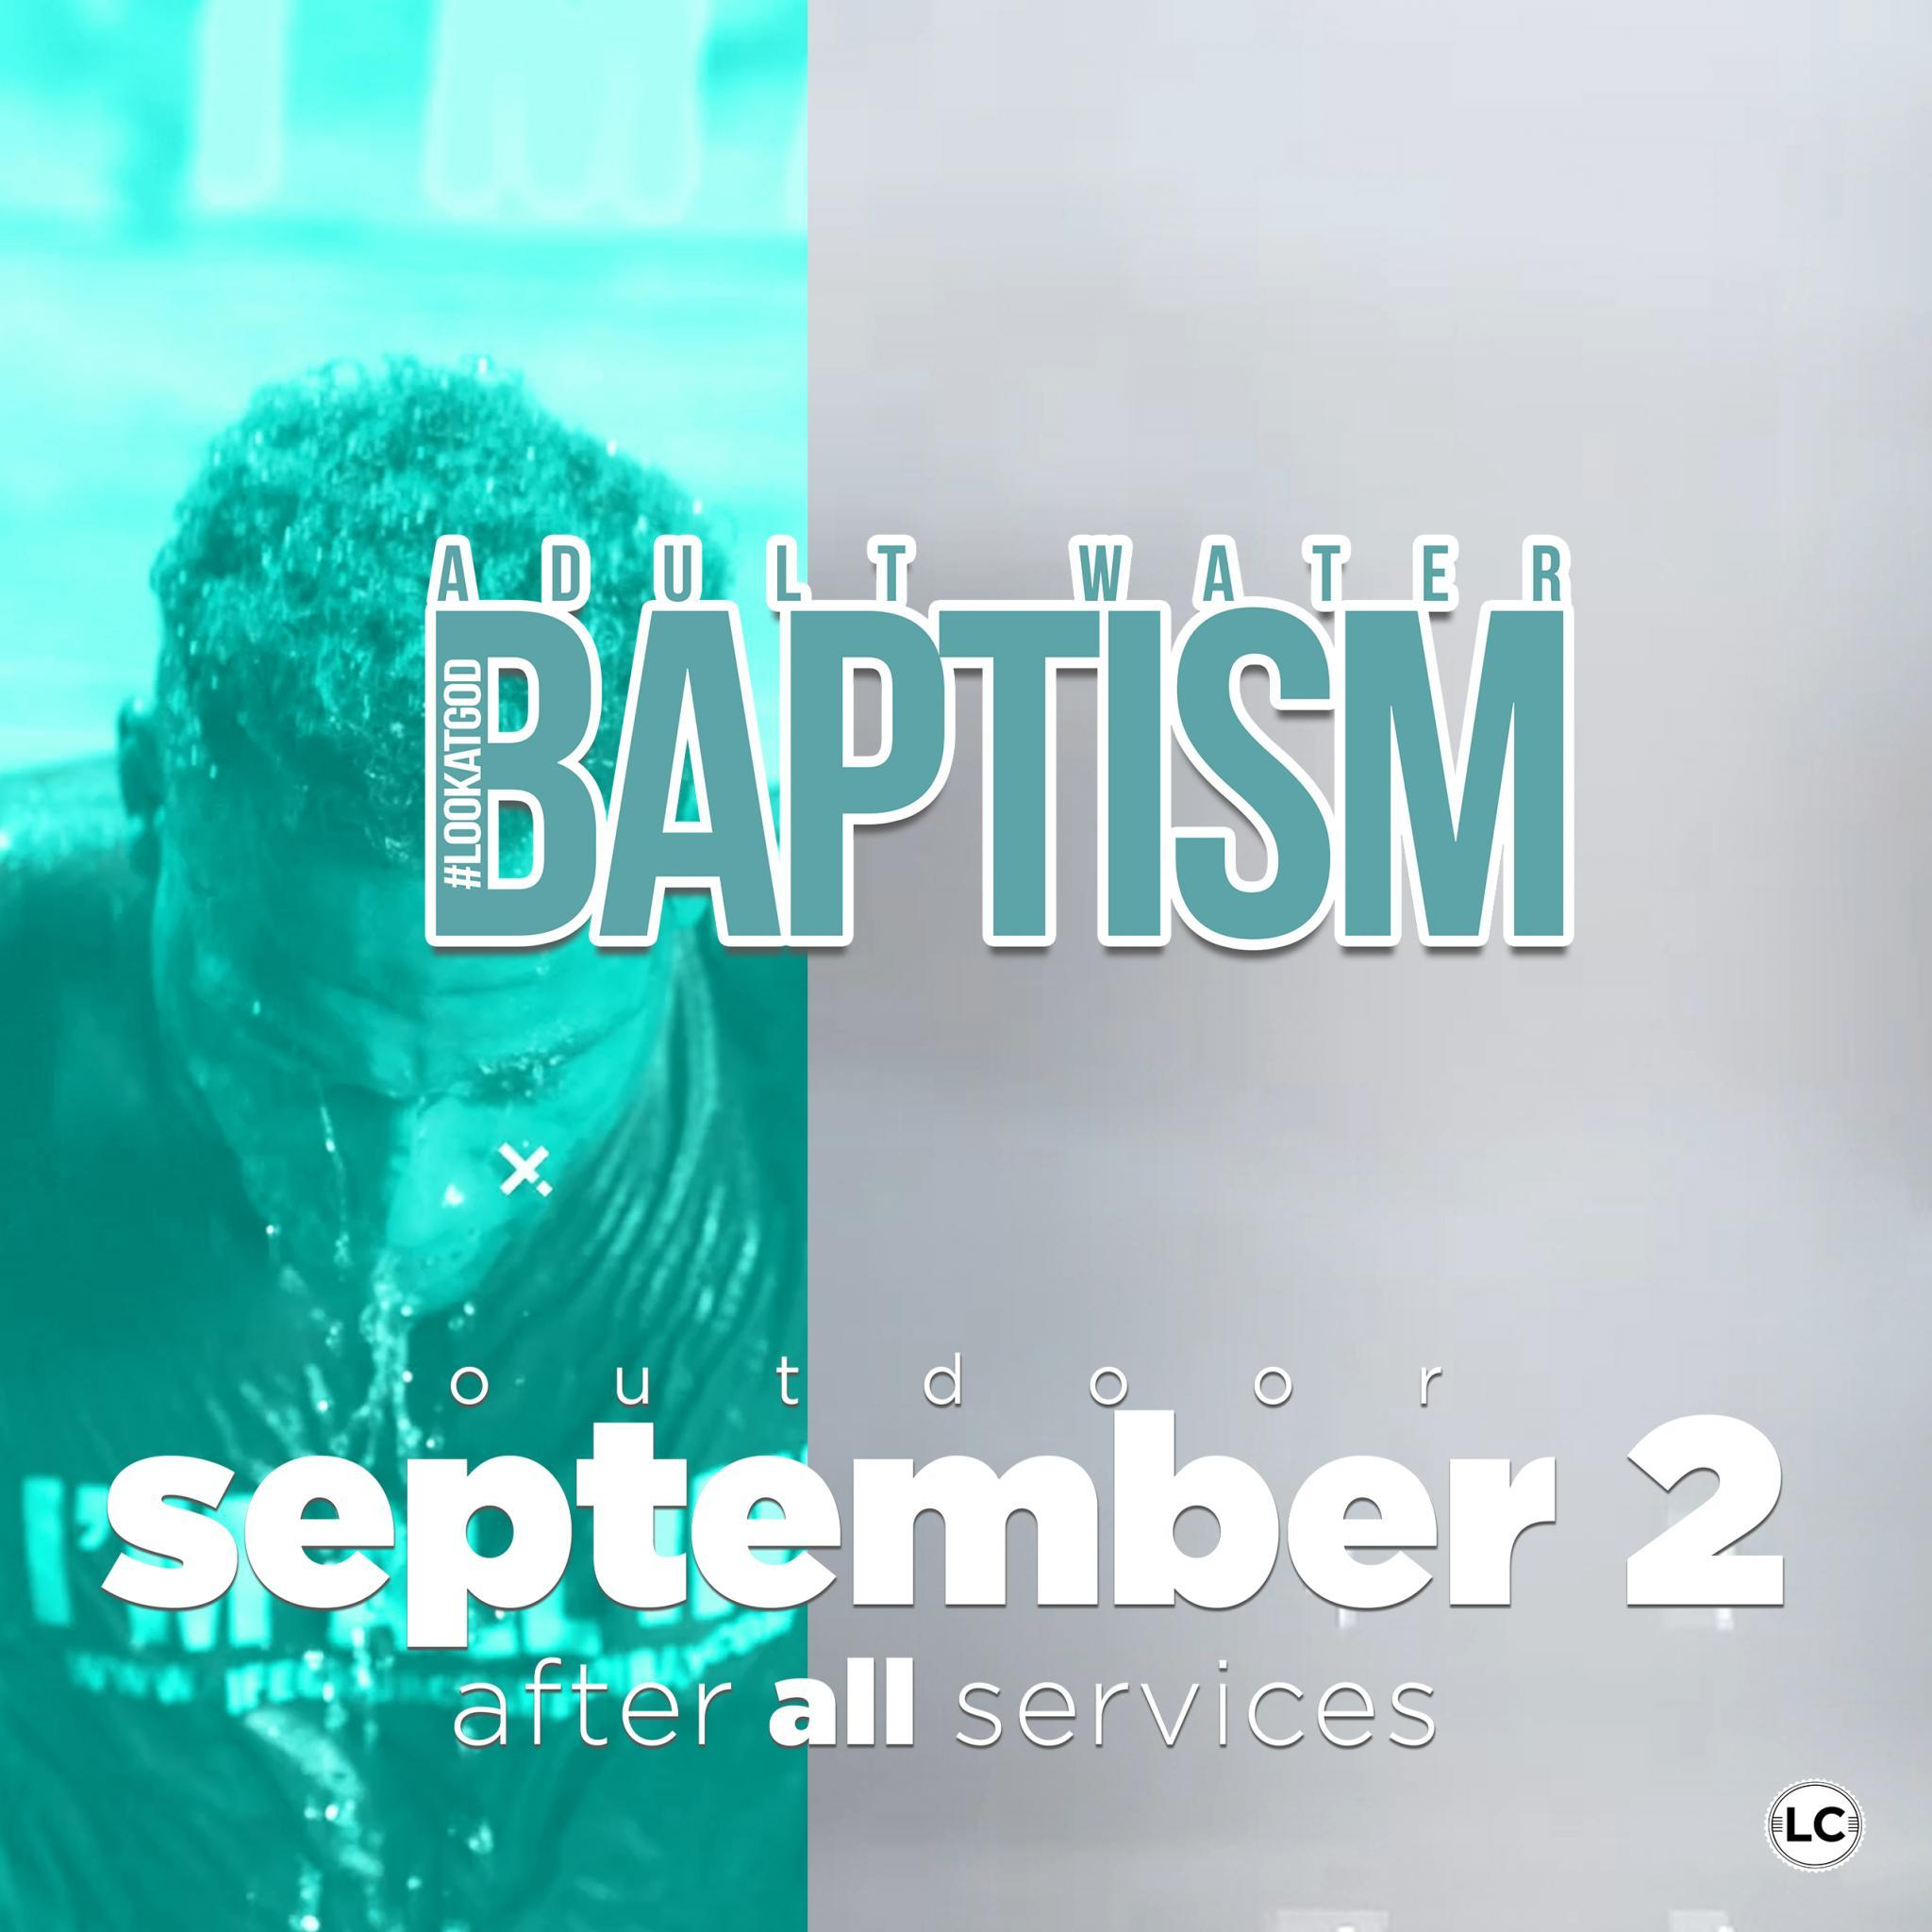 Fb baptism